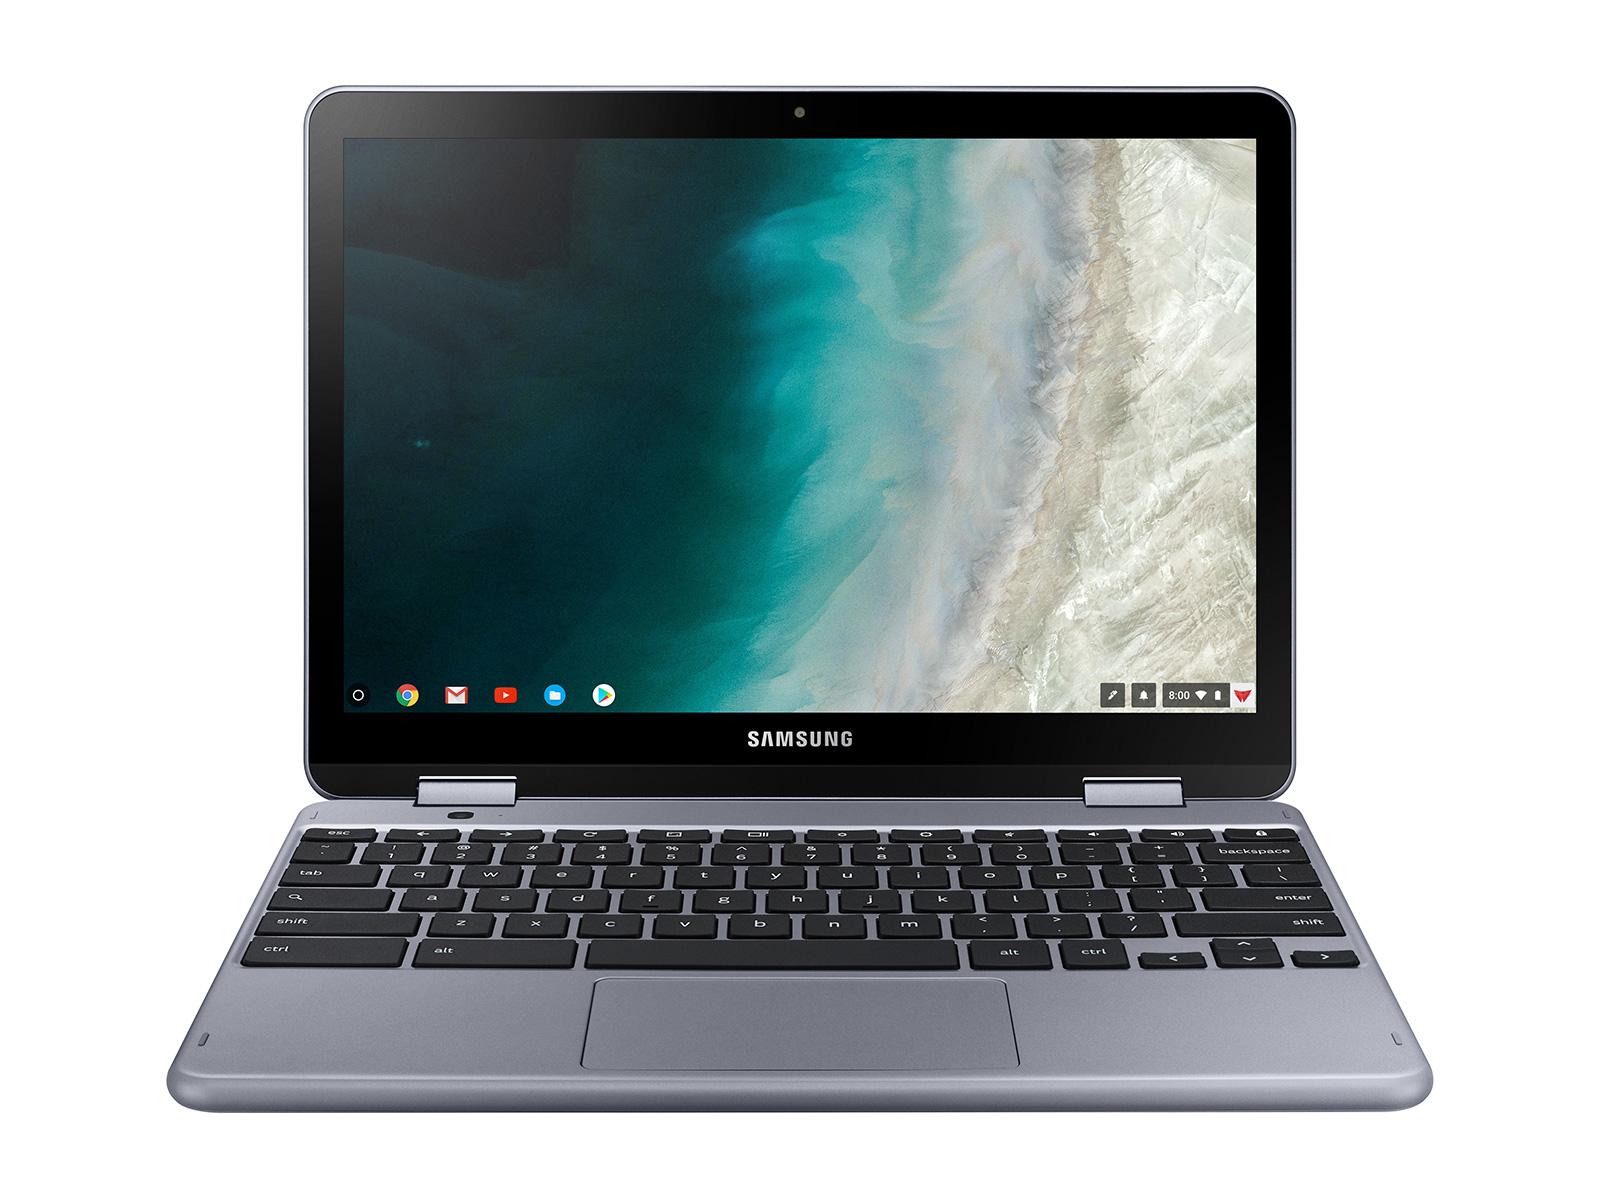 Samsung Discount Program Chromebook Plus V2 - XE521QAB-K01US | Samsung US $180